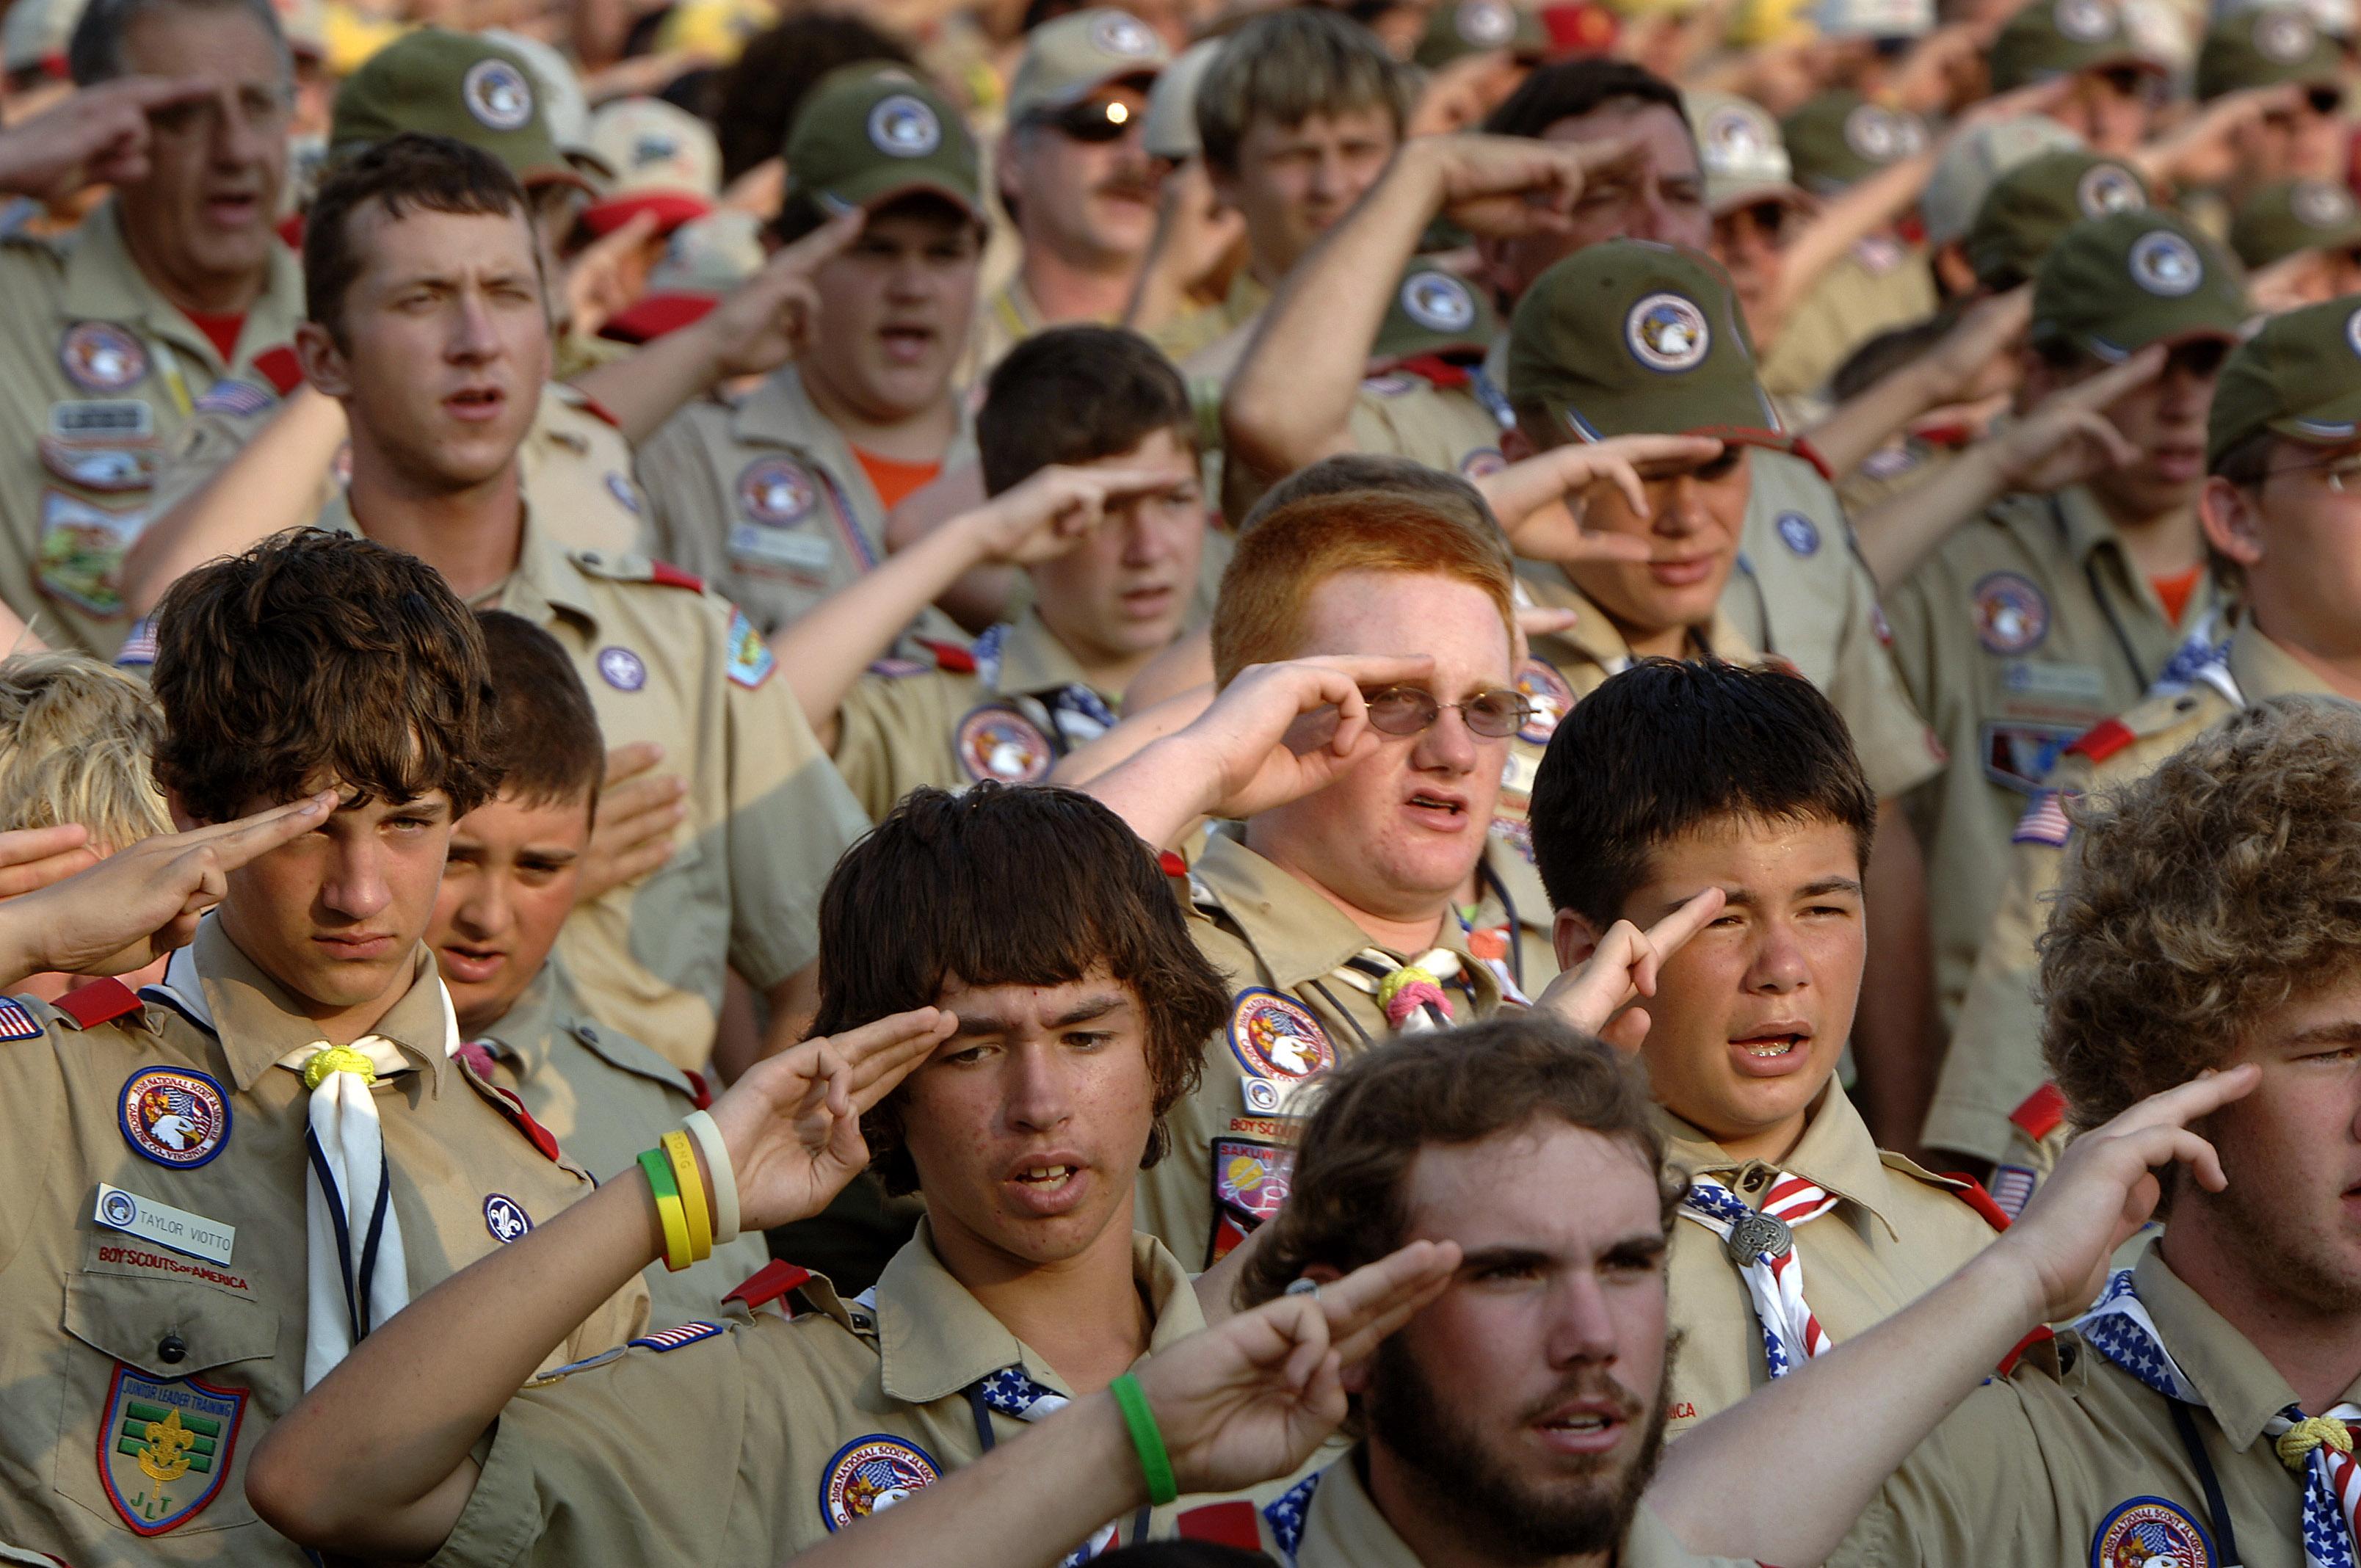 Boy S Scout Clothes At True Value In Kingman Az